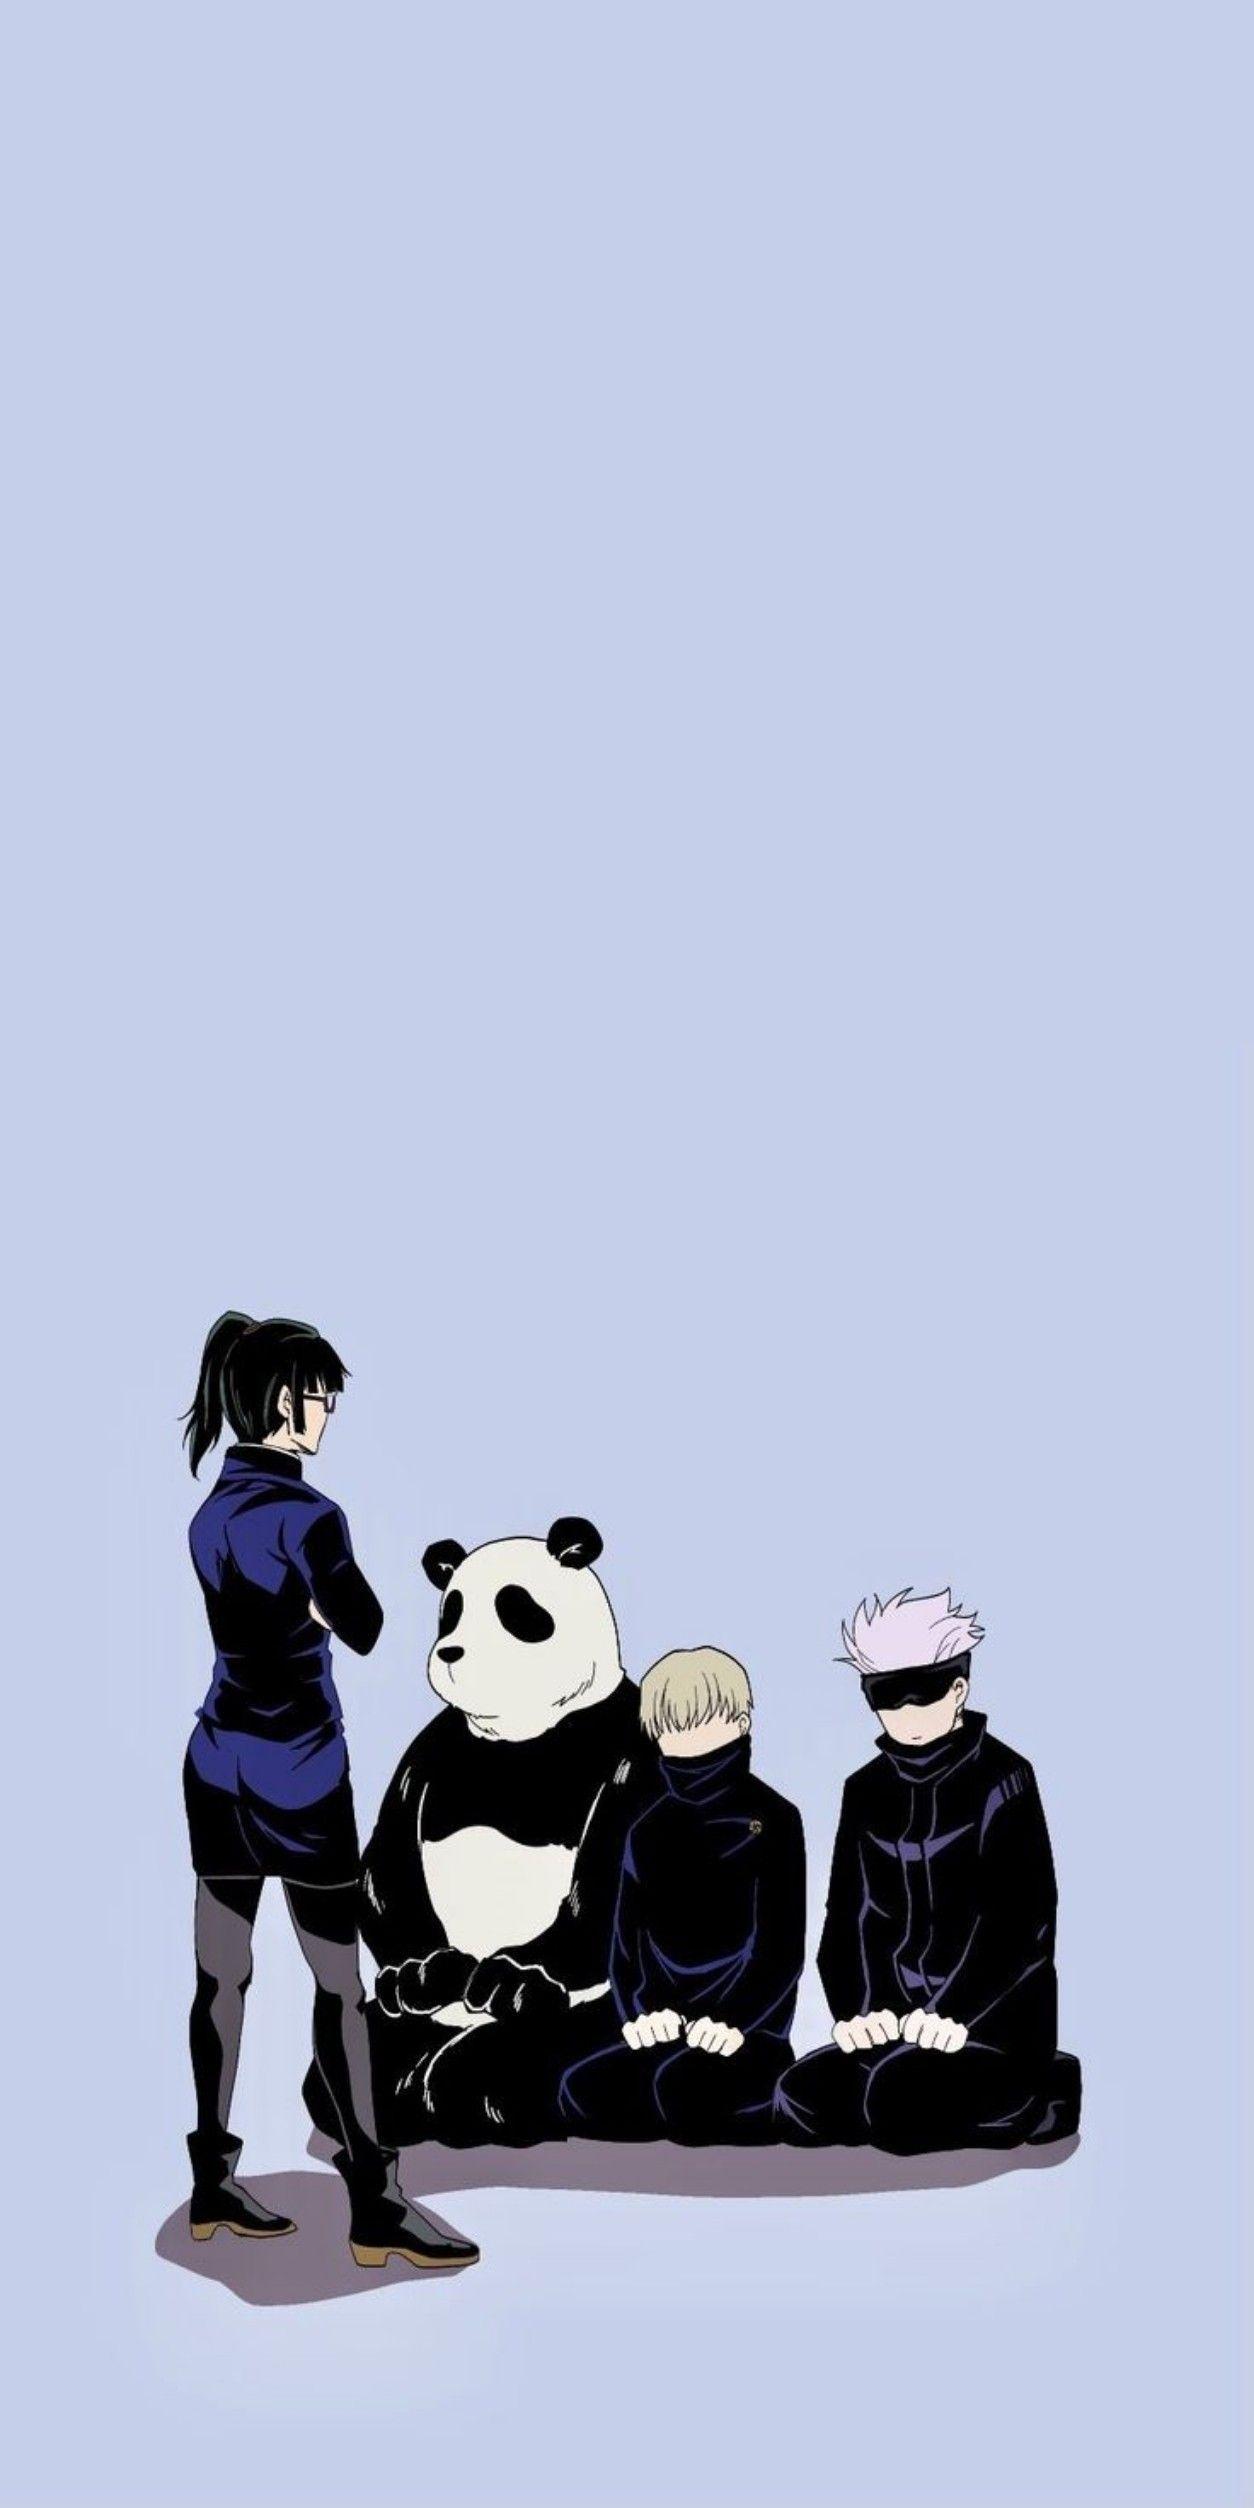 Jujutsu Kaisen Anime Canvas Jujutsu Cute Anime Wallpaper